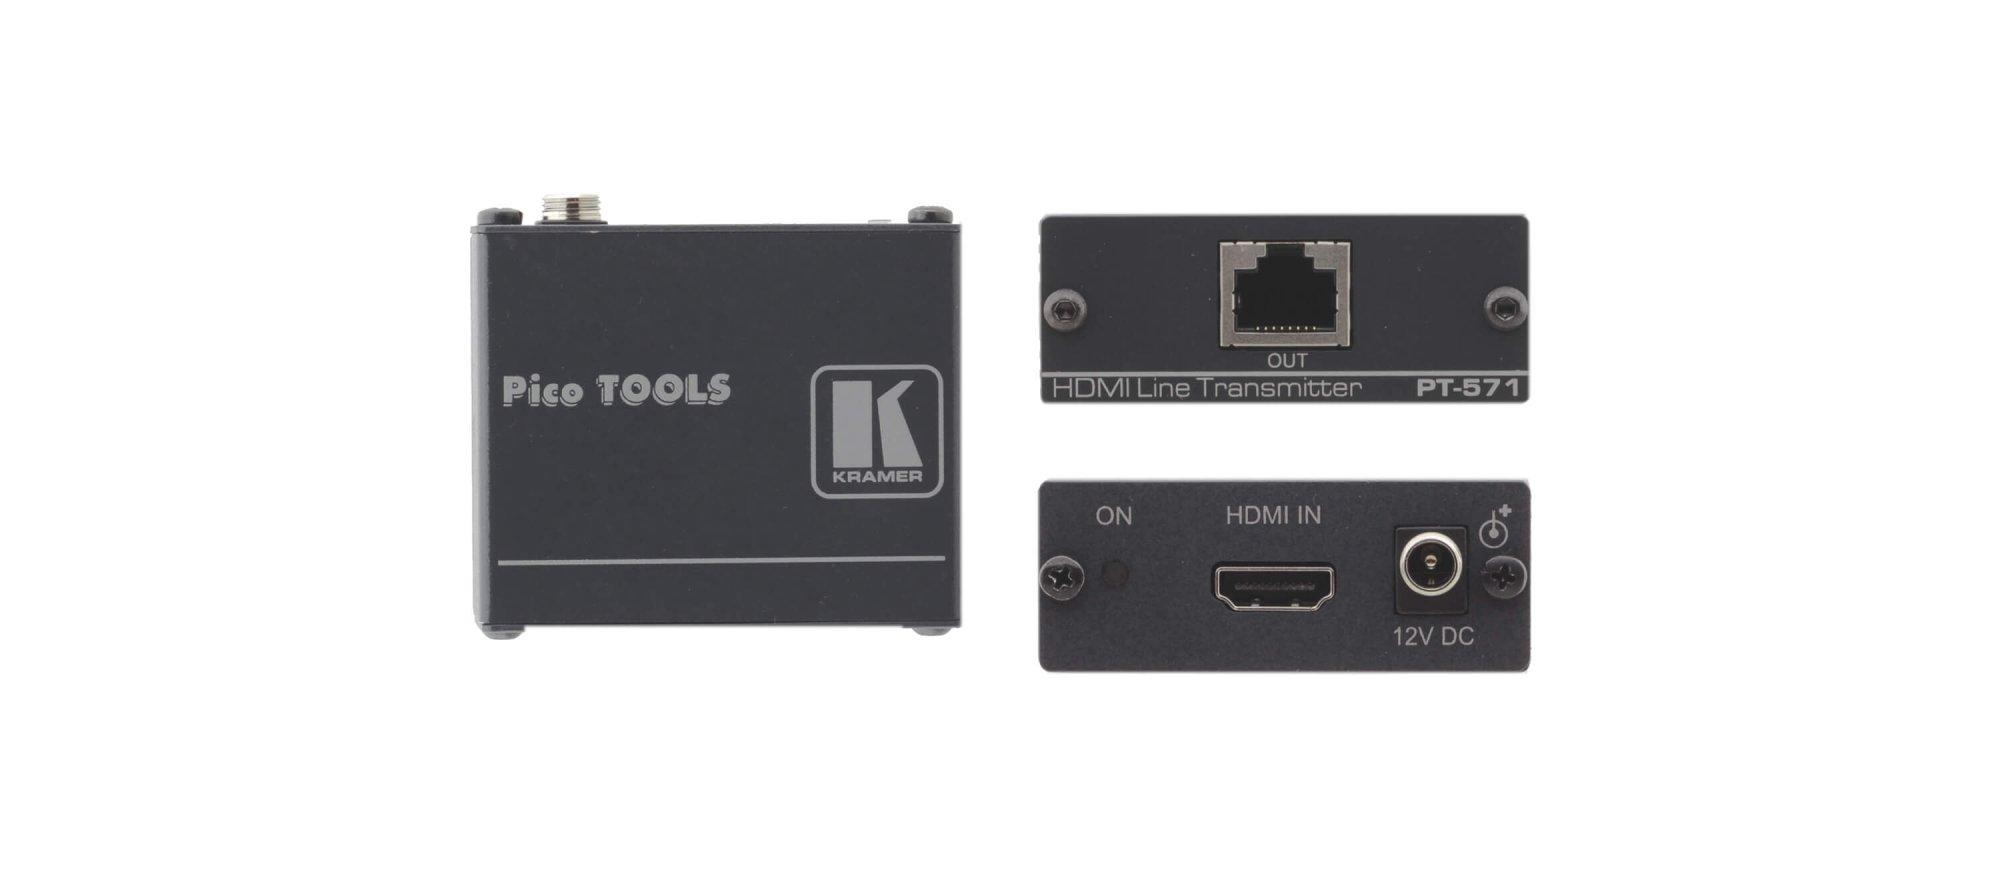 Rental Kramer PT-571 HDMI over Twisted Pair Transmitter - Cat6 Only